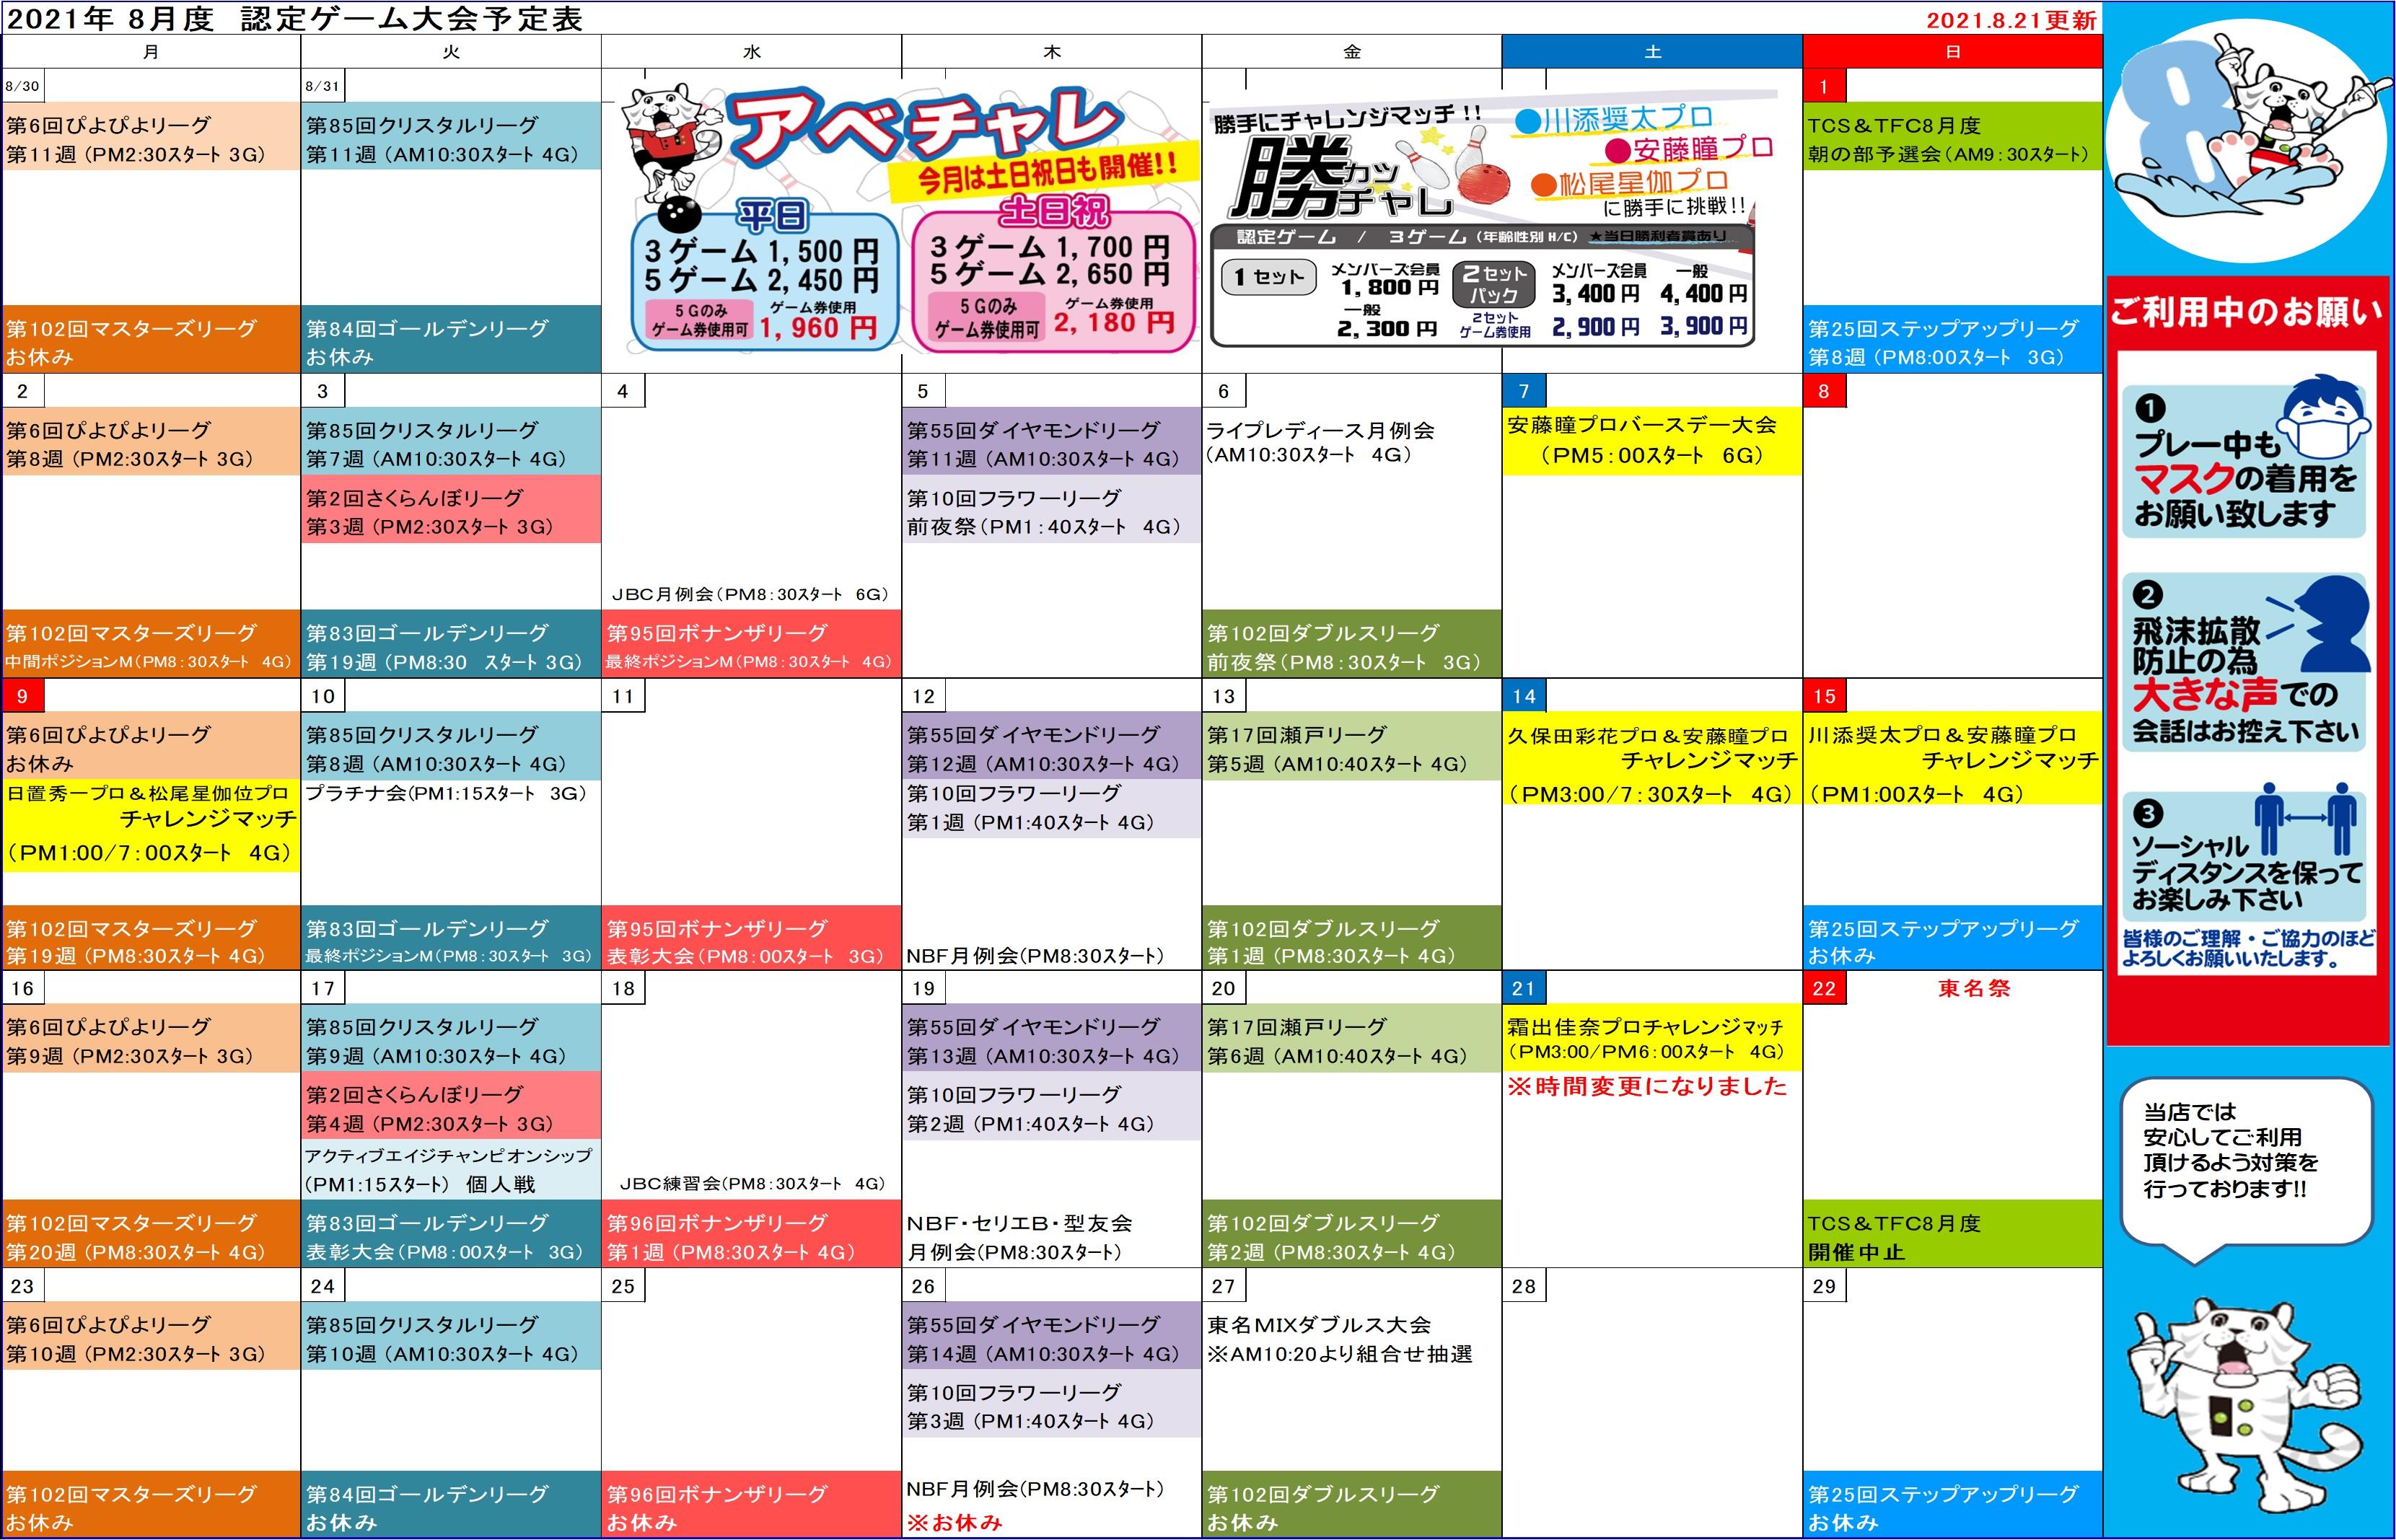 ★会員様向け★8月認定ゲーム大会予定表改正